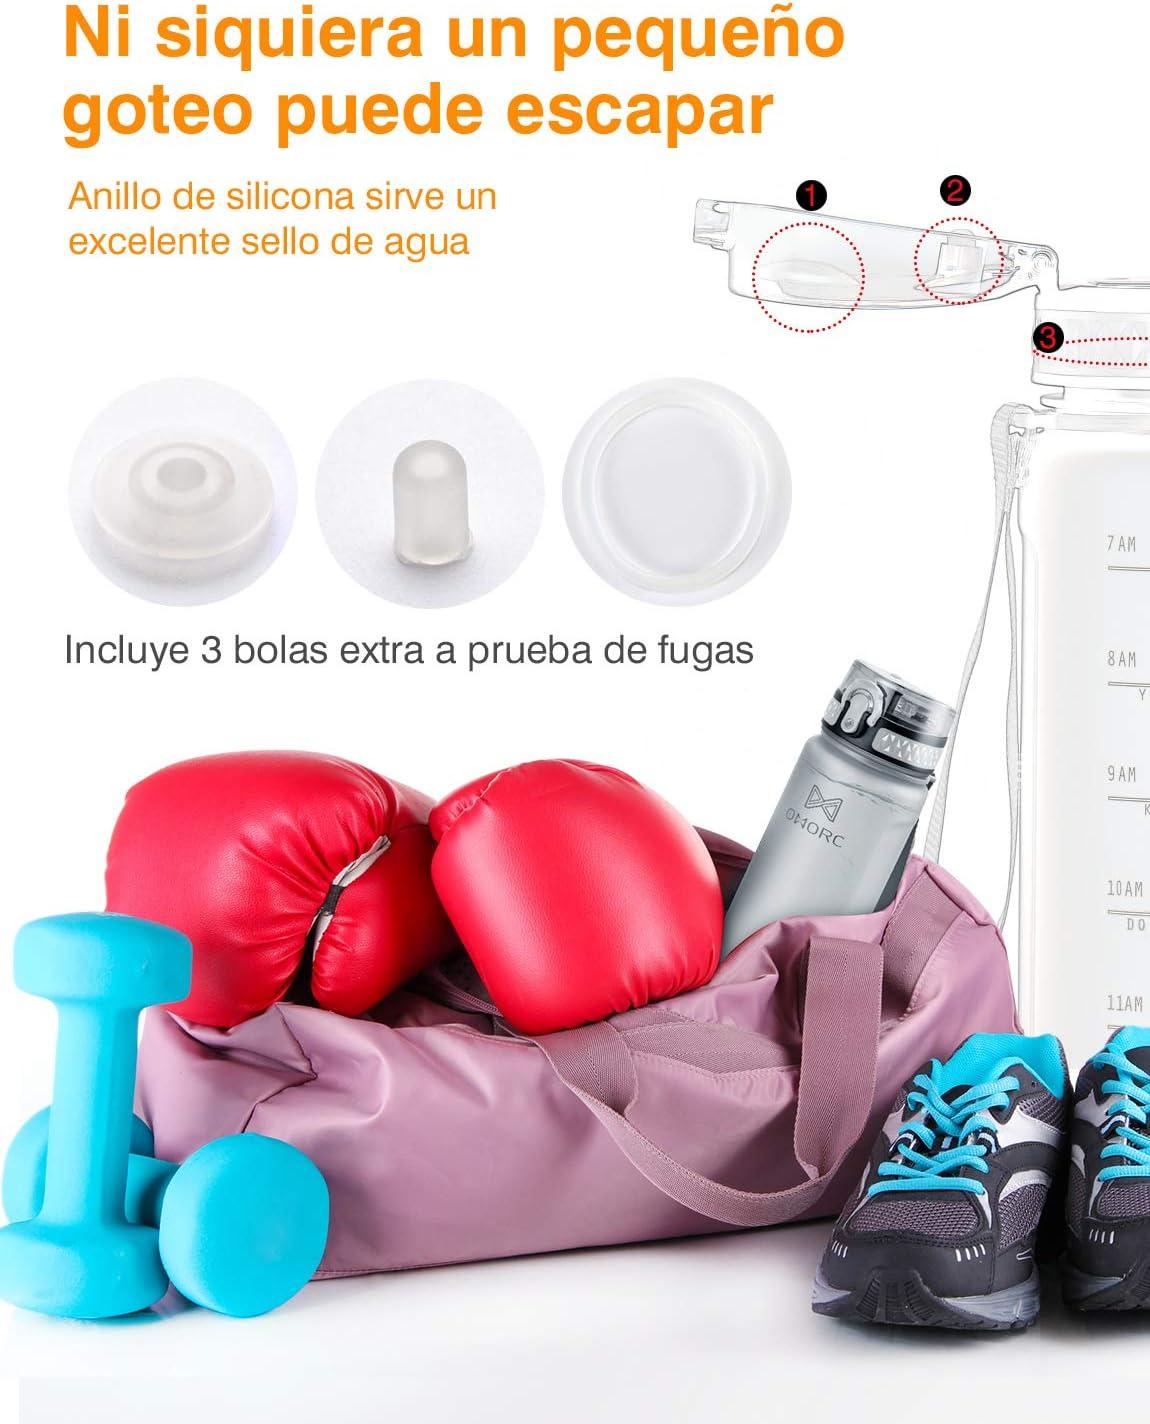 Botella Plastica Tritan Reutilizable Filtro 900ml Cepillo de Limpieza/&Marcador de Tiempo Botella Agua Gimnasio OMORC Botella Agua Deporte sin BPA